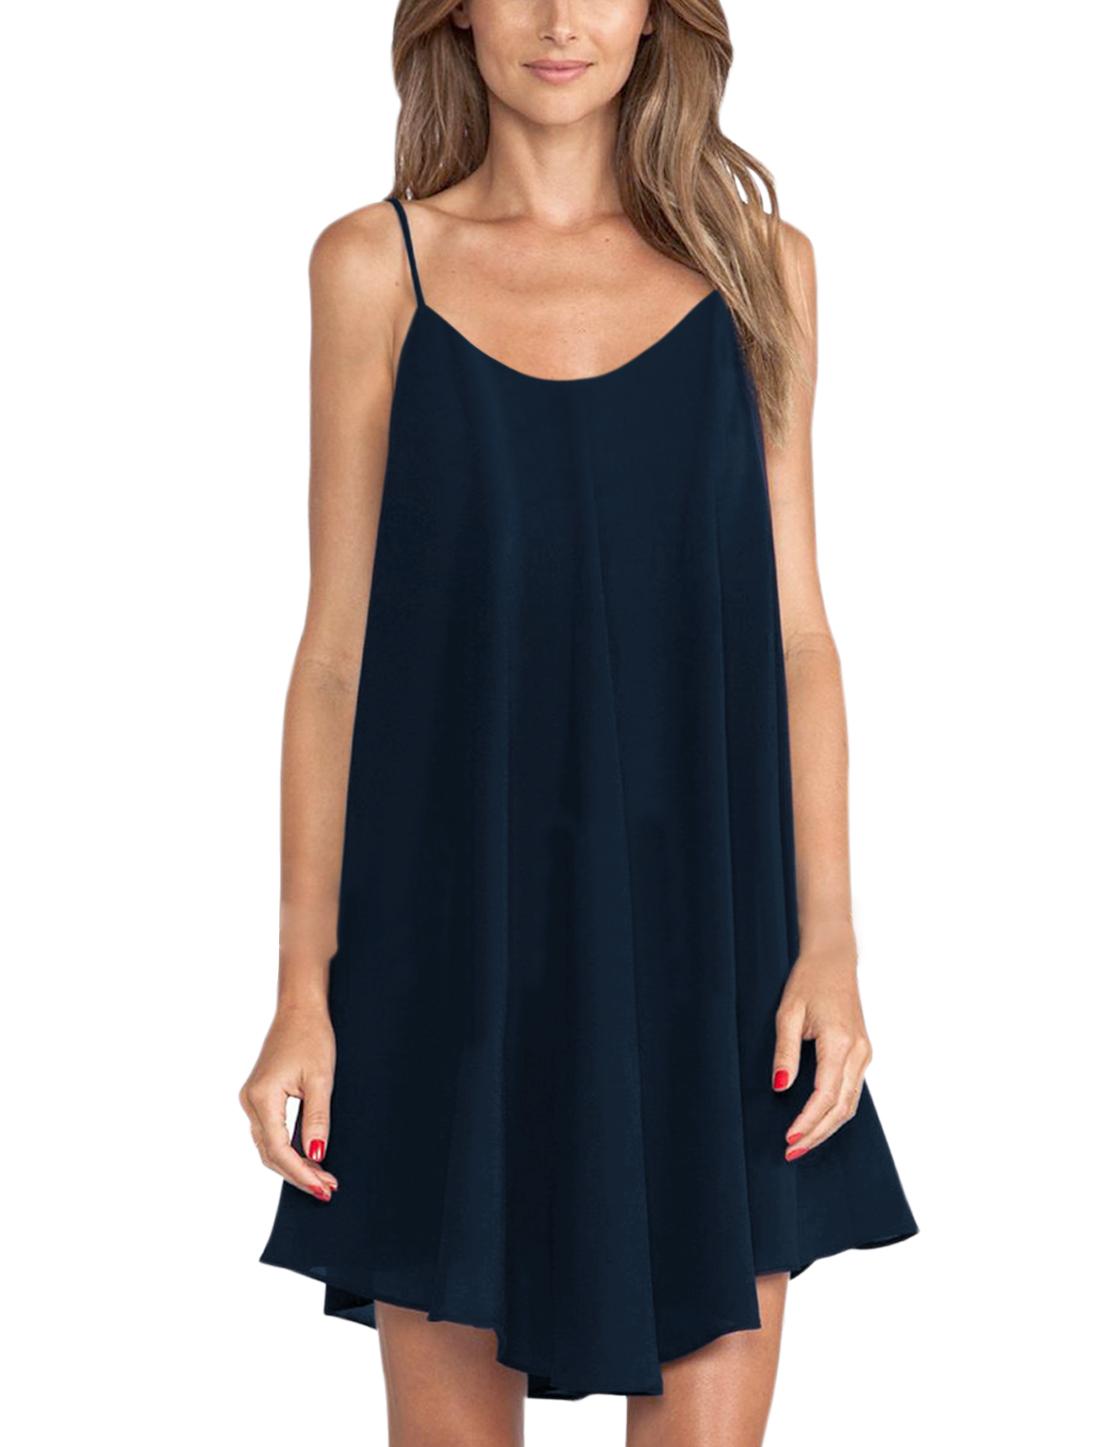 Women Scoop Neck Open Back Sleeveless A Line Dress Navy Blue XS